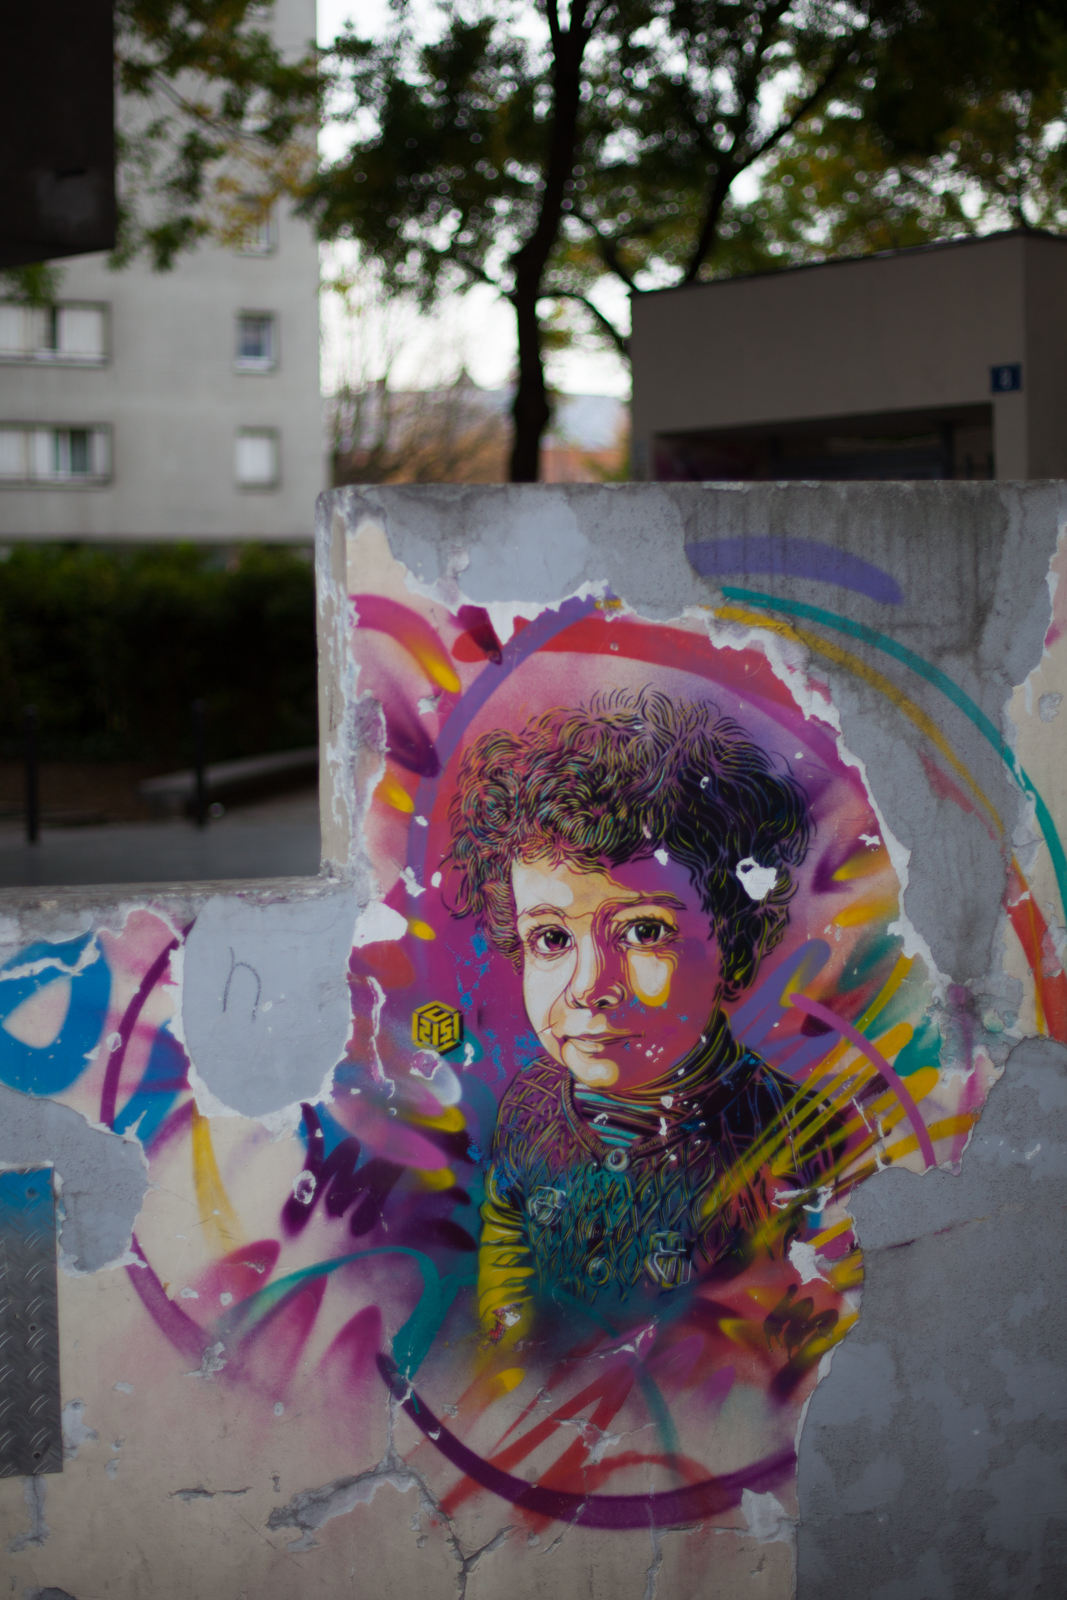 street art vitry-sur-seine, street art vitry, street art val-de-marne, street art banlieue paris, art urbain vitry, art urbain vitry-sur-seine, art urbain vitry, le guide du street art à paris, stéphanie lombard, C215